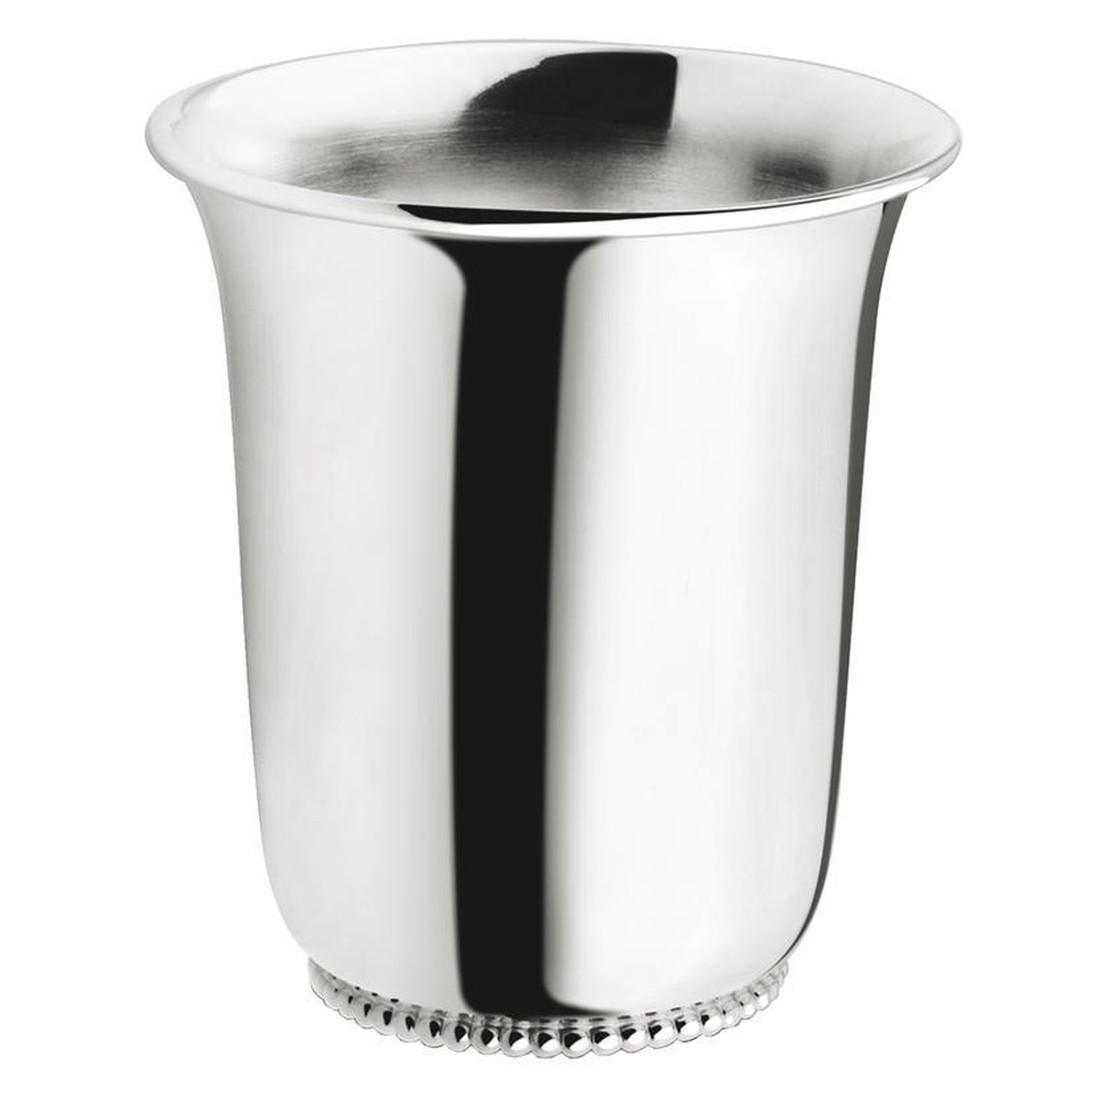 kinderbecher perl metall silber zilverstad g nstig online kaufen. Black Bedroom Furniture Sets. Home Design Ideas